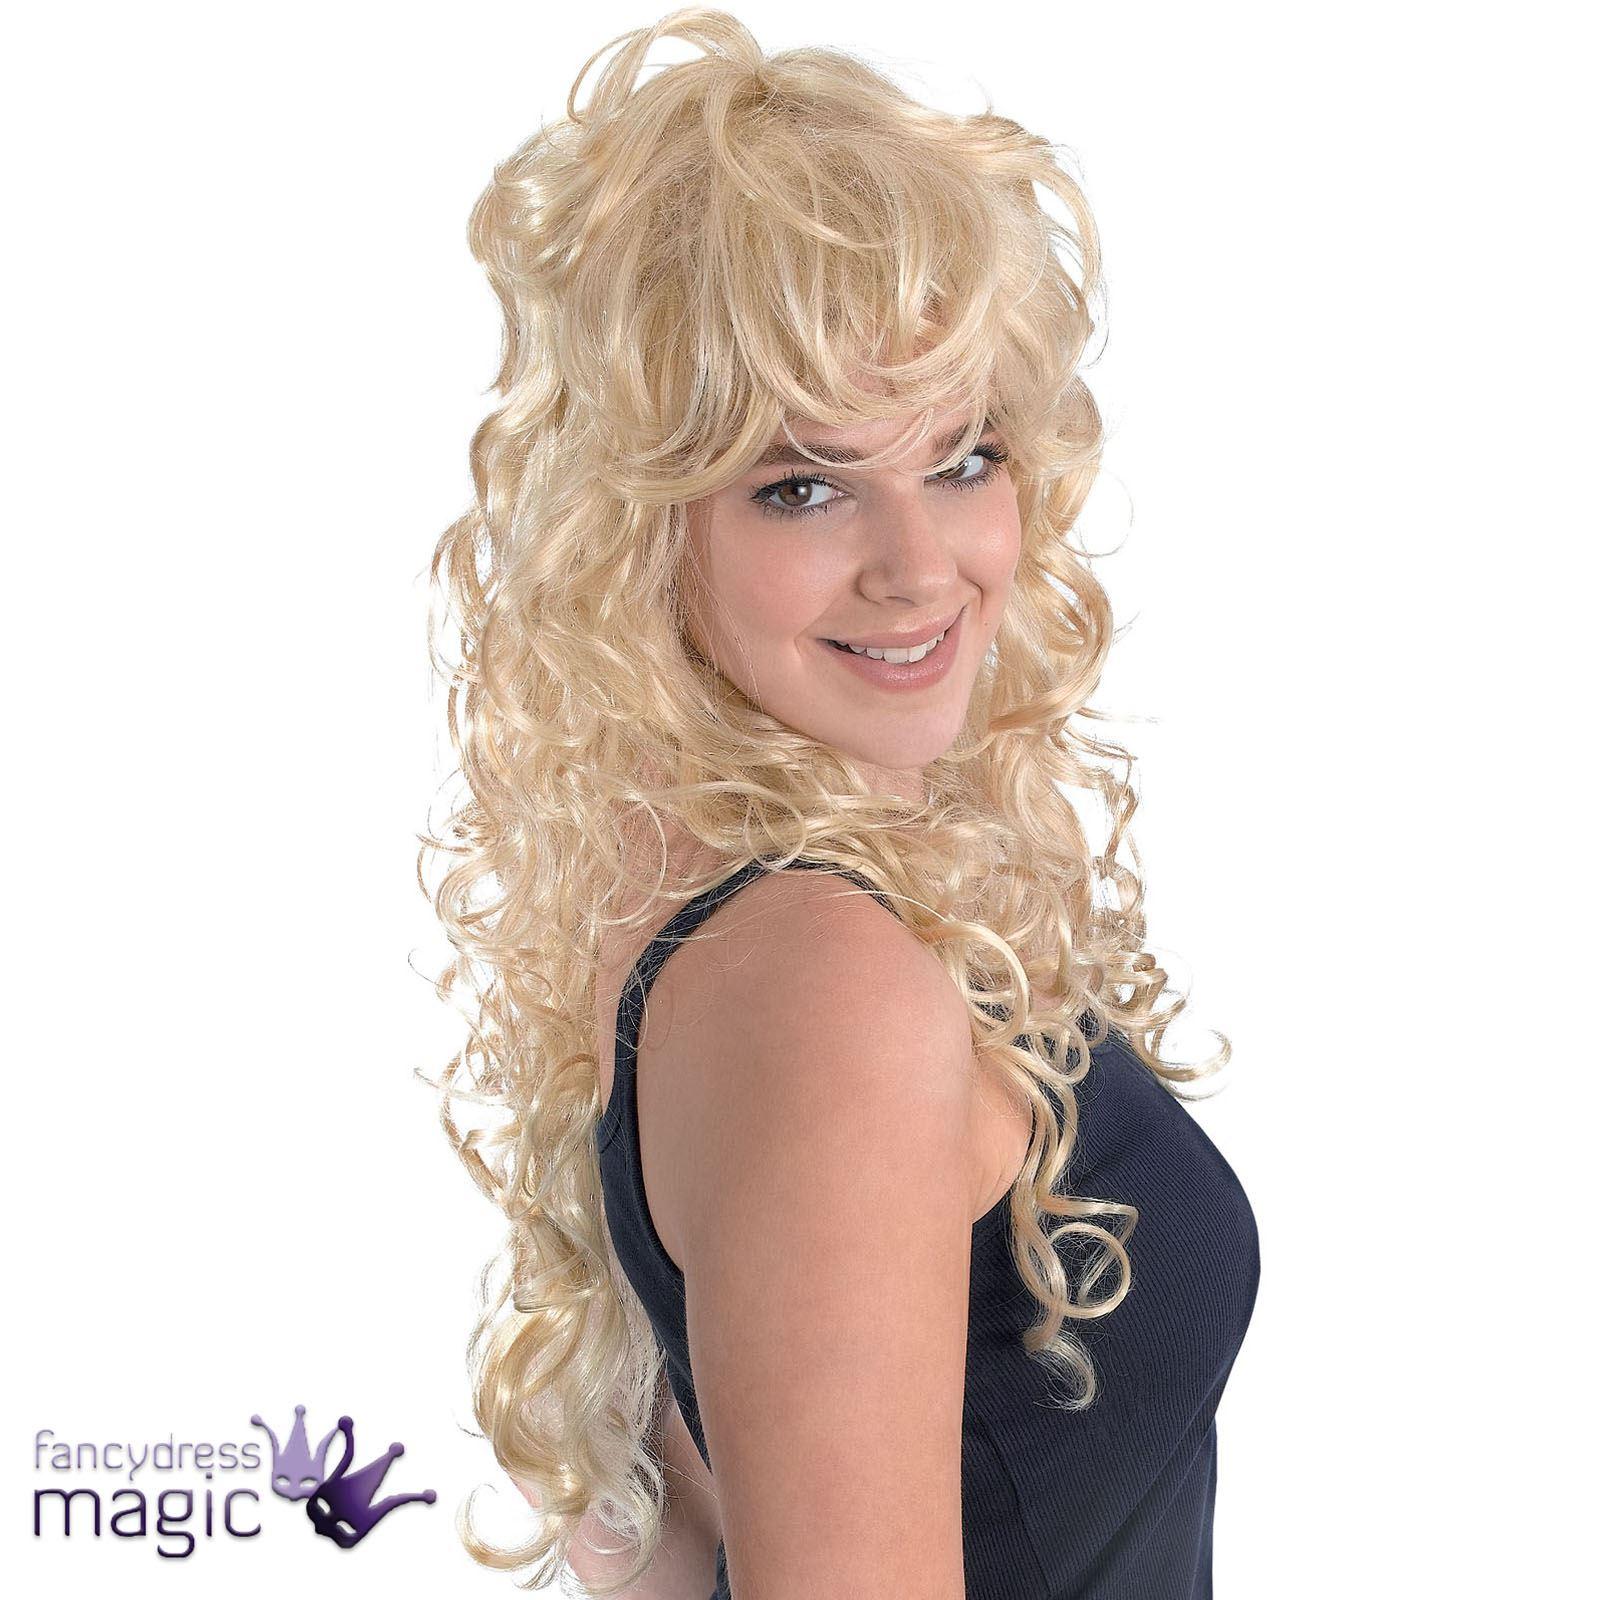 Ladies Long Blonde Curly Punk Rock Chick Dolly Parton Fancy Dress Costume Wig  sc 1 st  eBay & Ladies Long Blonde Curly Punk Rock Chick Dolly Parton Fancy Dress ...